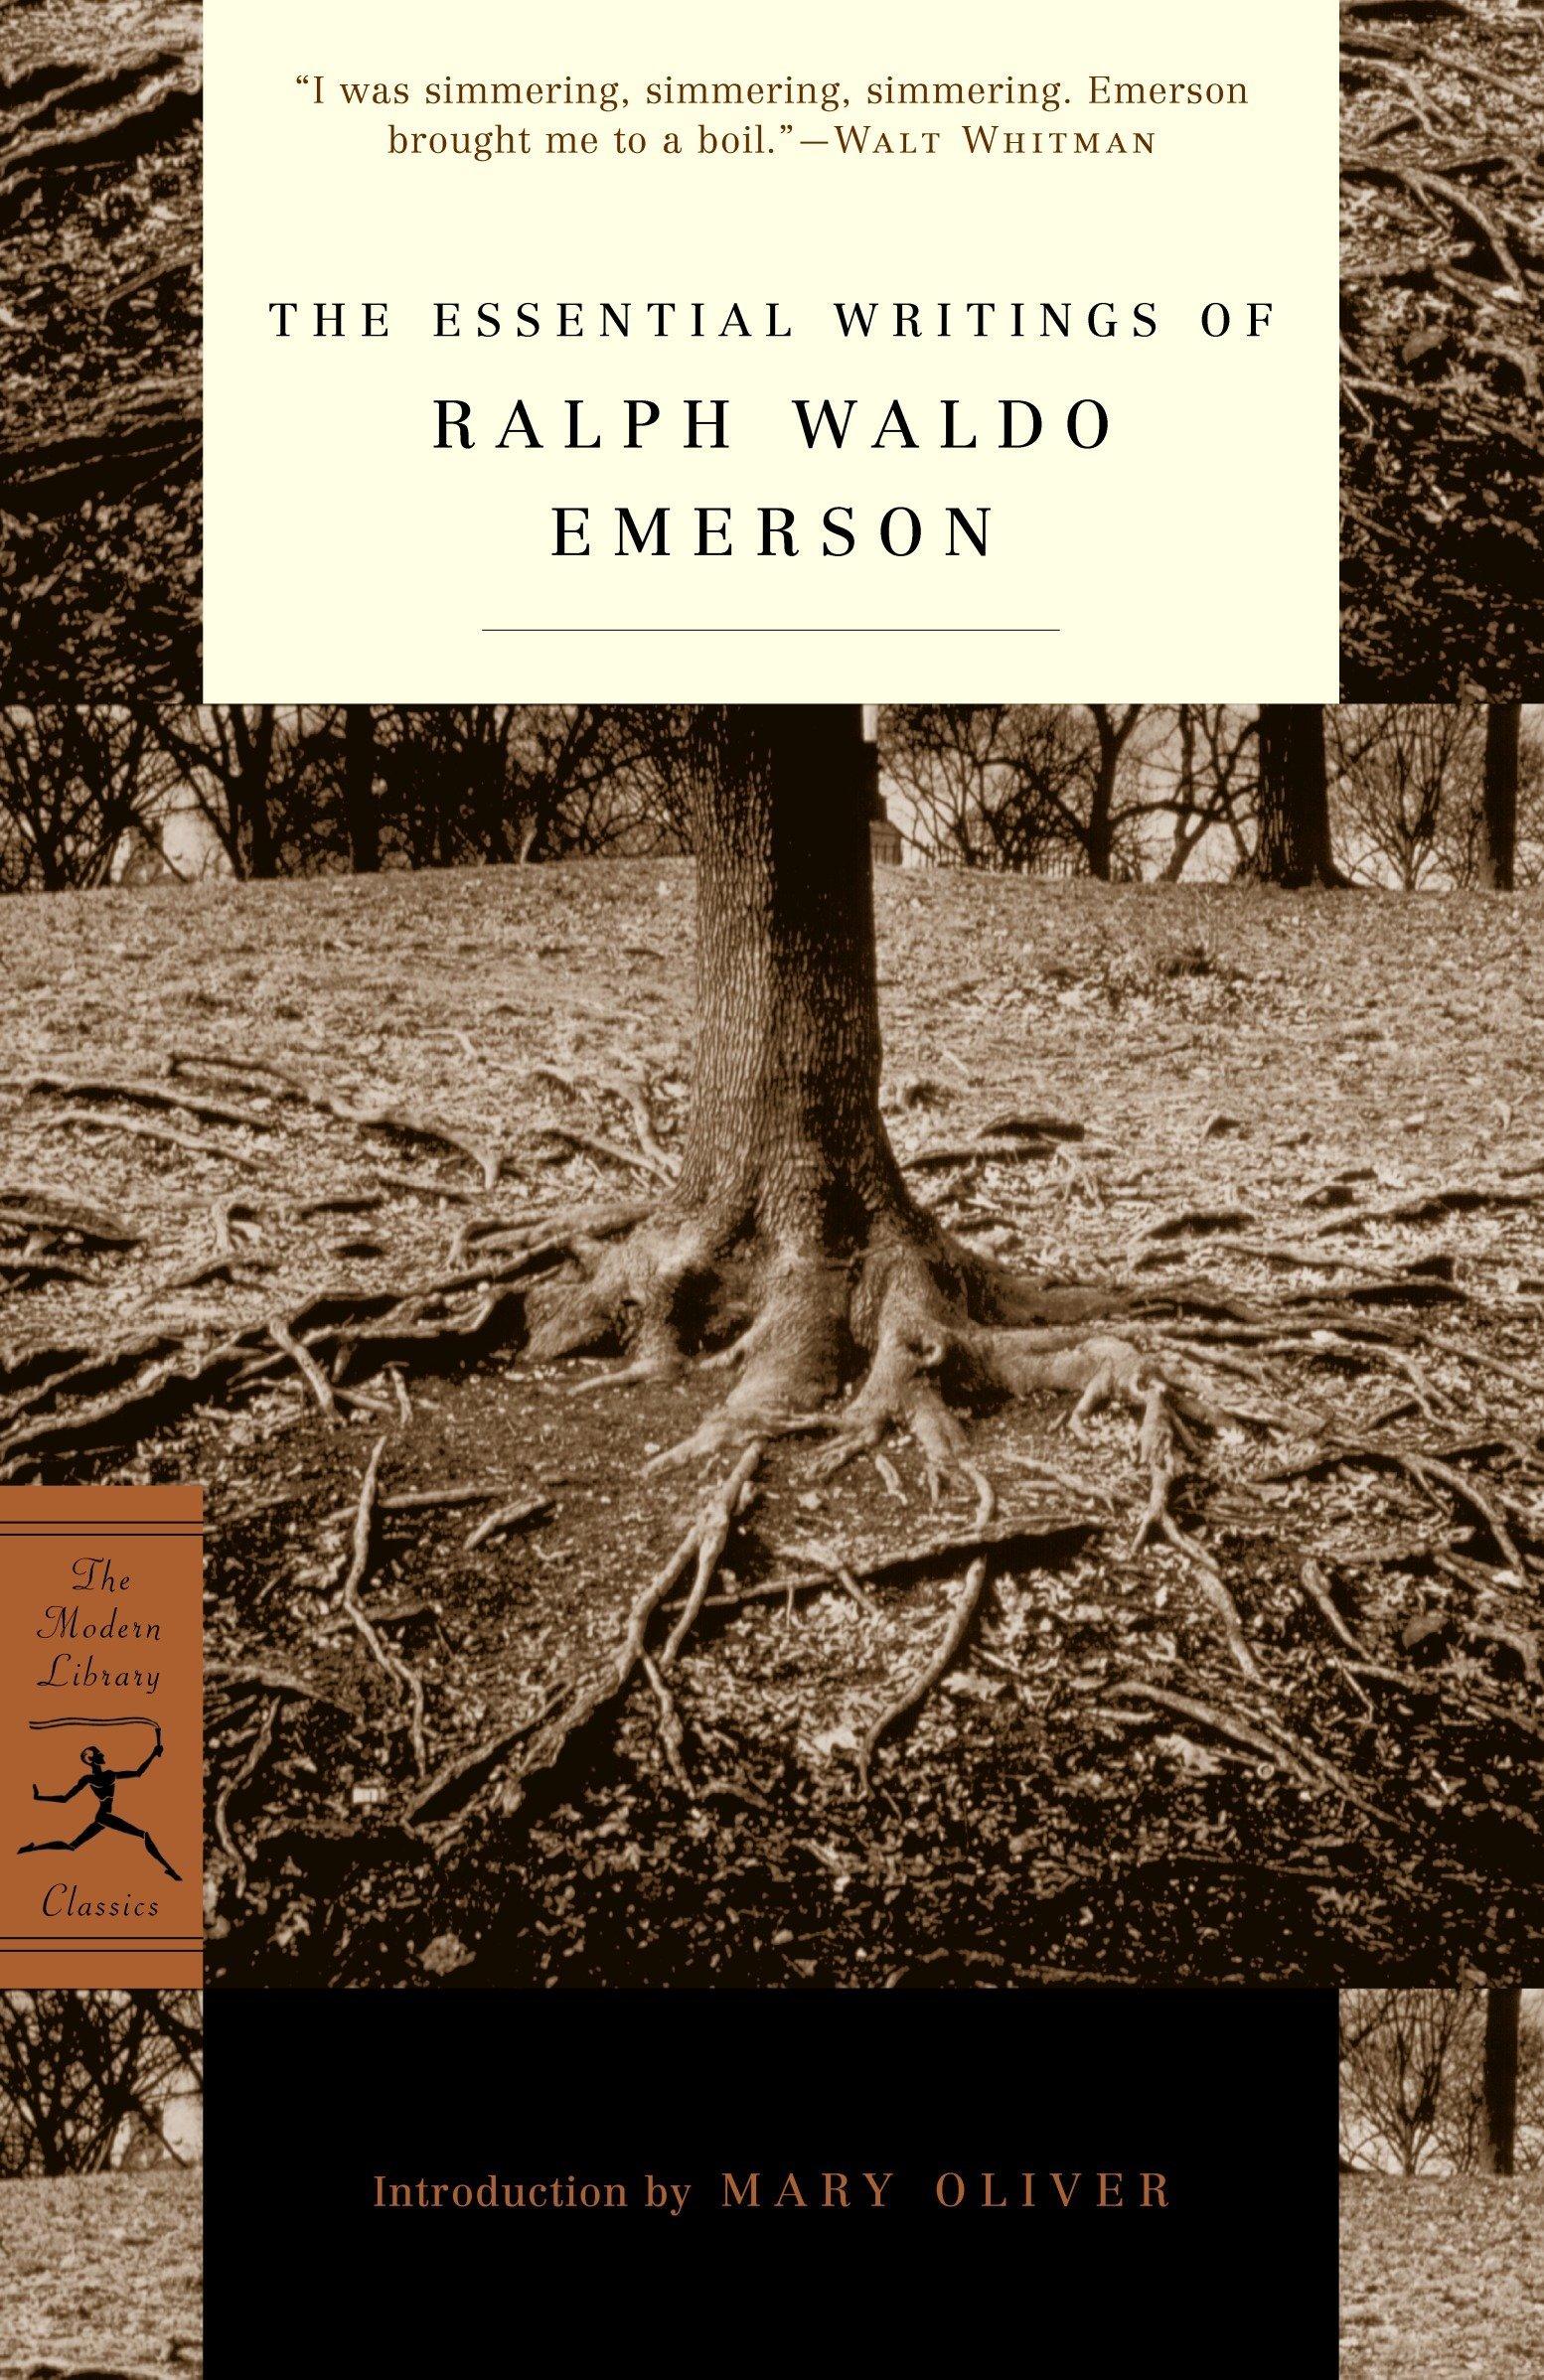 The Essential Writings of Ralph Waldo Emerson (Modern Library Classics): Ralph  Waldo Emerson, Brooks Atkinson, Mary Oliver: 9780679783220: Amazon.com:  Books